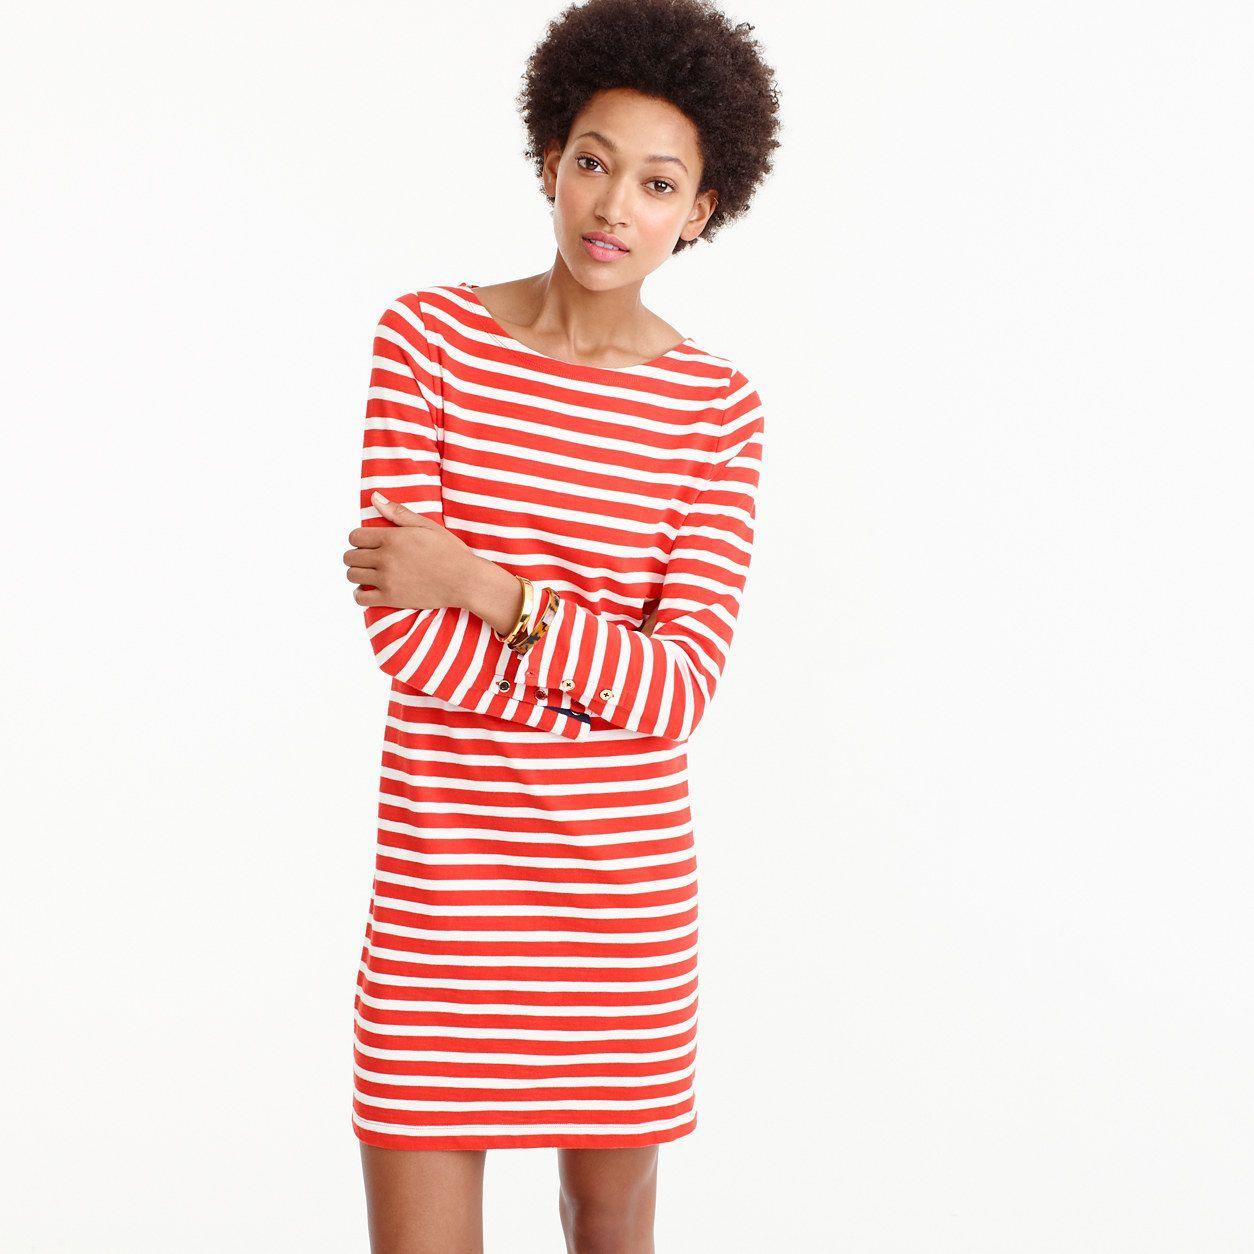 697799e1793 J.Crew Womens Striped T-Shirt Dress (Size XXL)